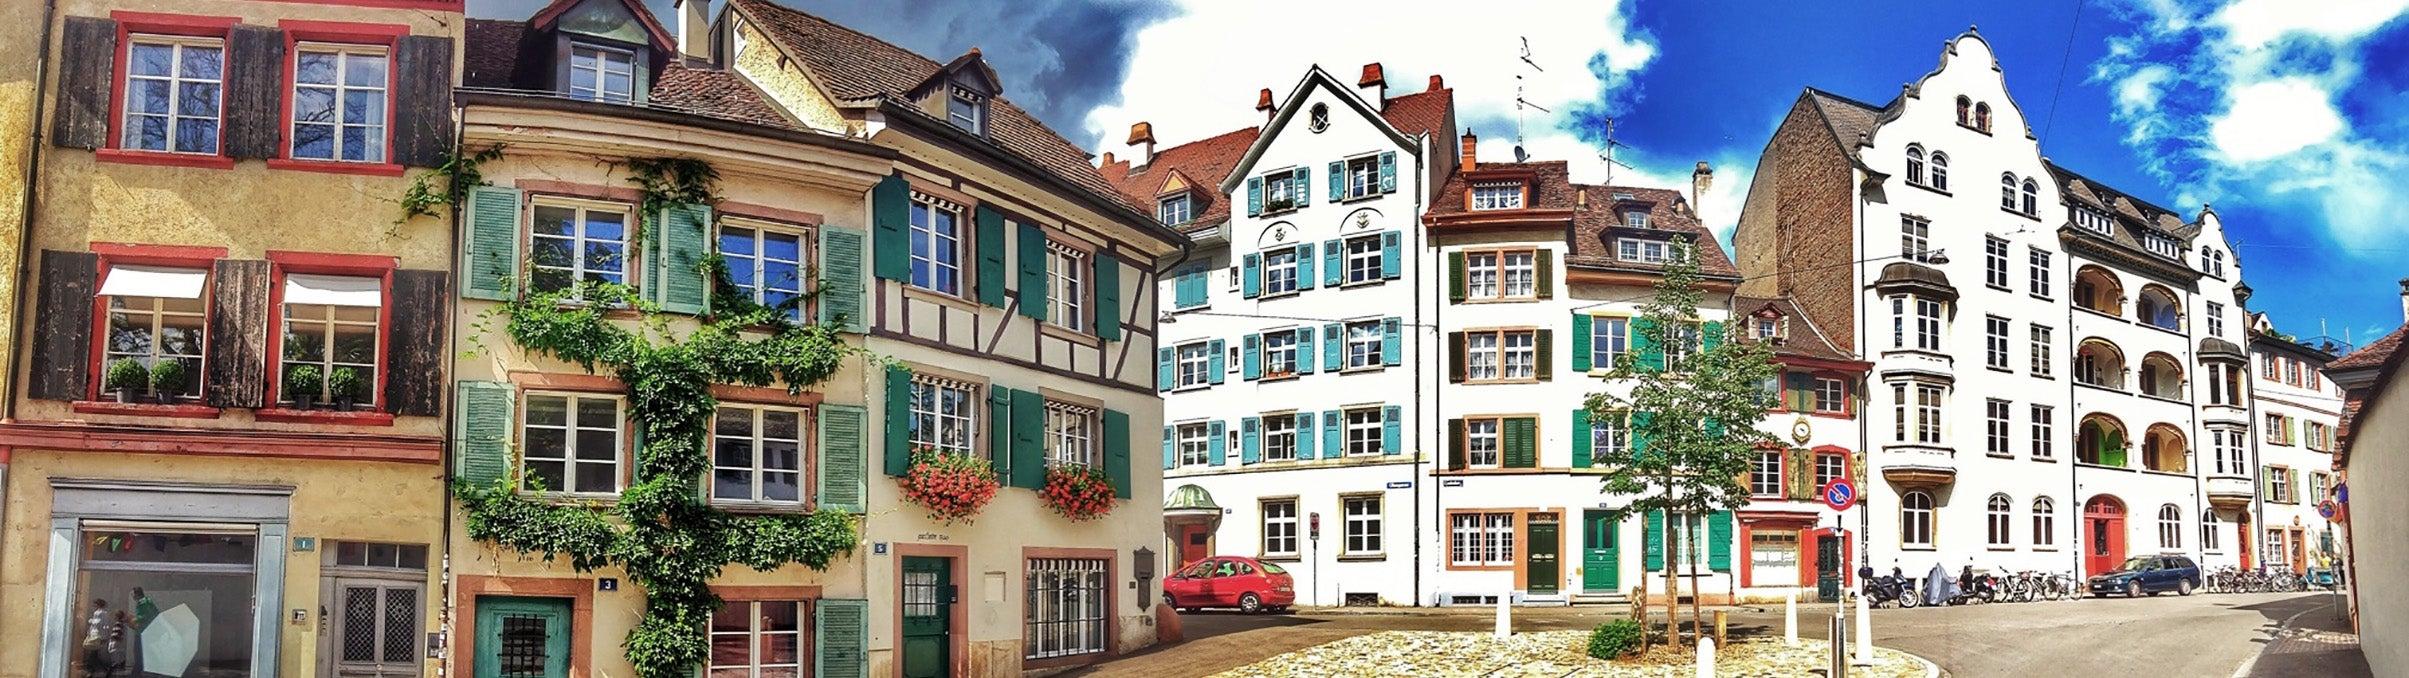 Basel, Altstadt Kleinbasel